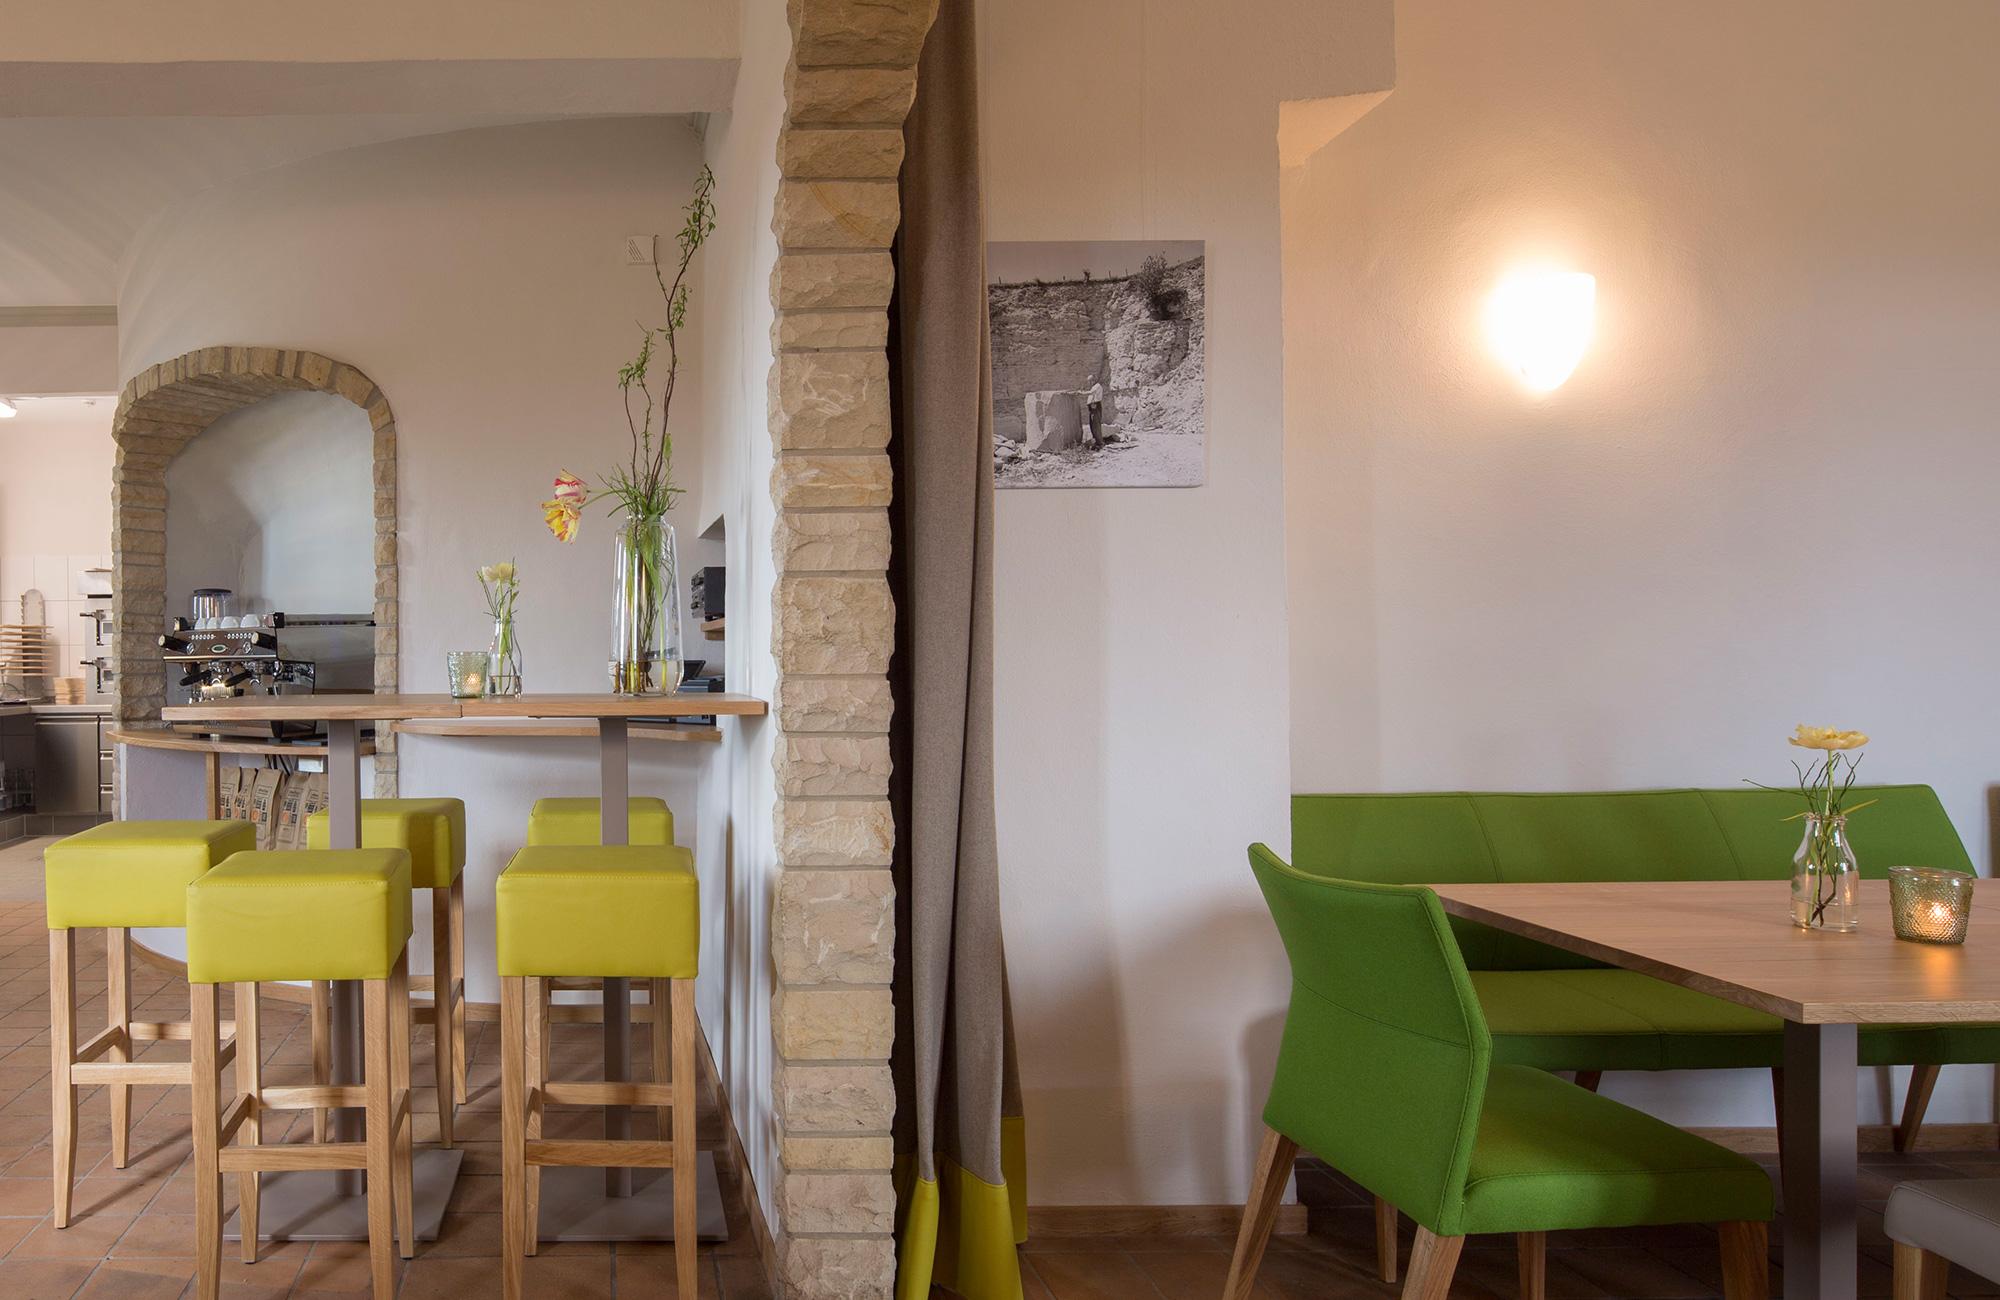 Cafe 18|97 Longinusturm